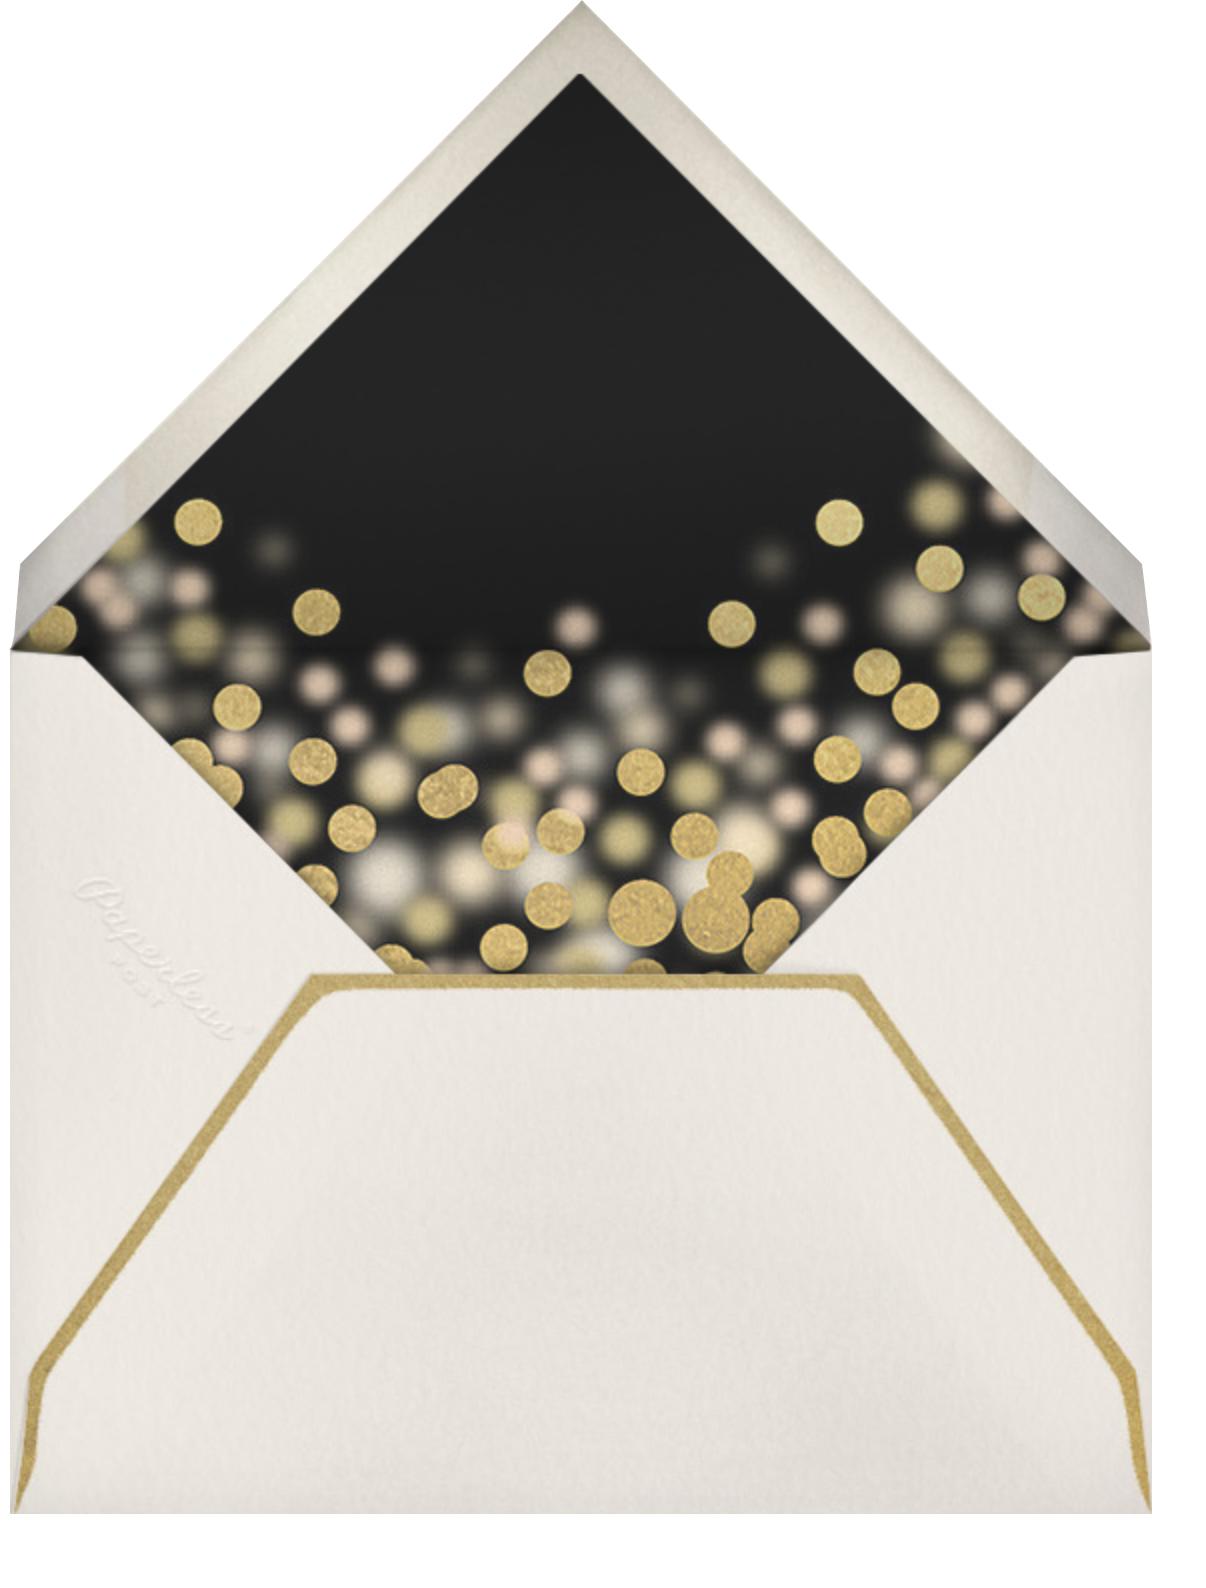 Sparkle Lights (Invitation) - Black - Paperless Post - New Year's Eve - envelope back